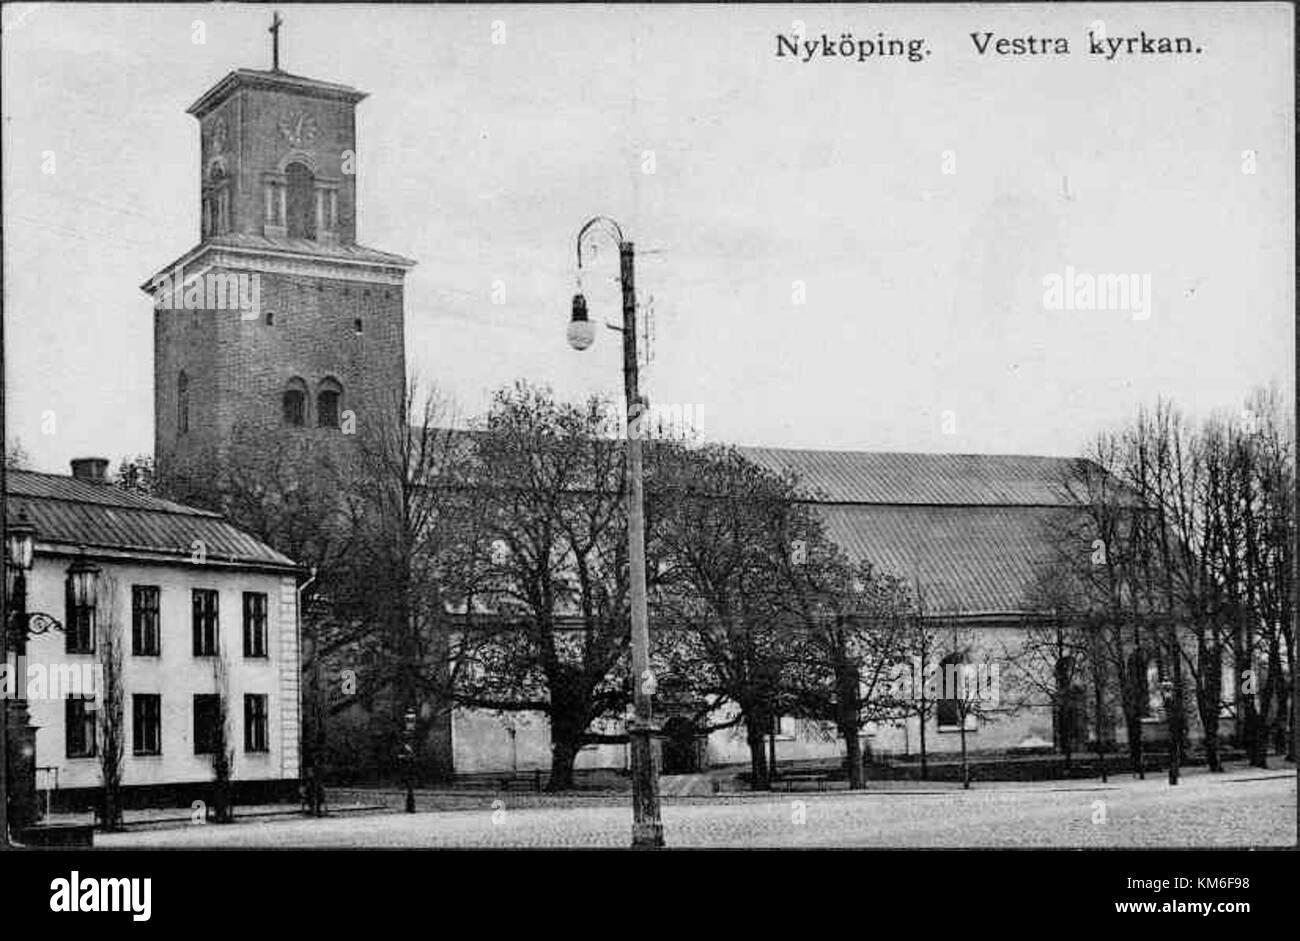 Sankt Nicolai kyrka, Nykping Wikipedia